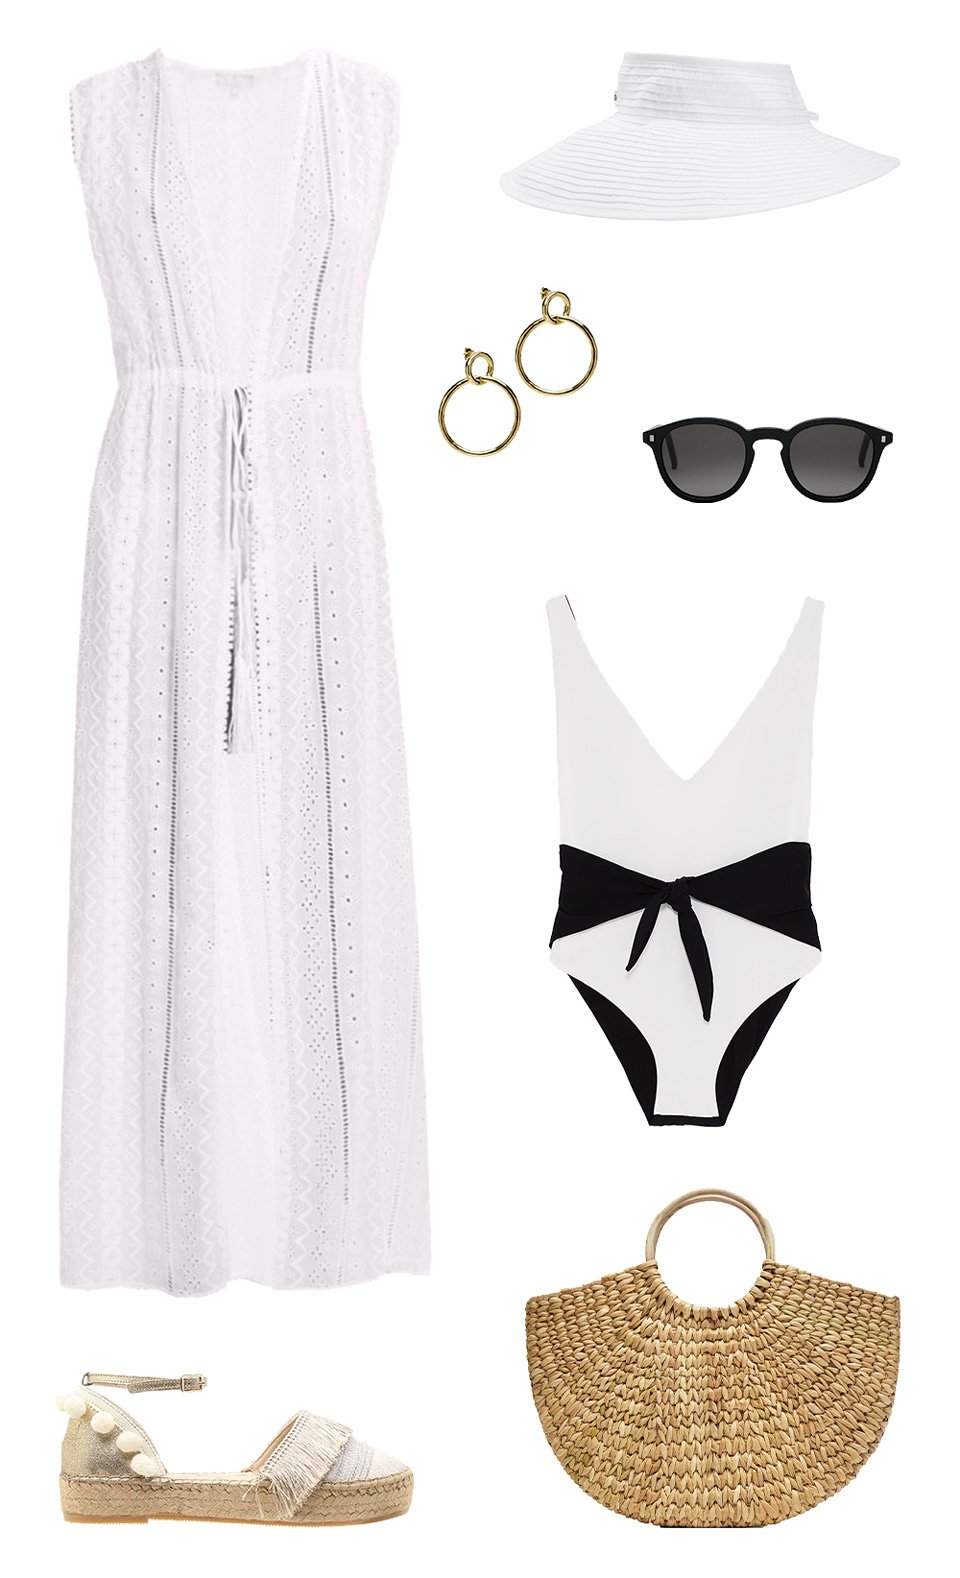 Hat, dress, bikini, sunglasses, check!